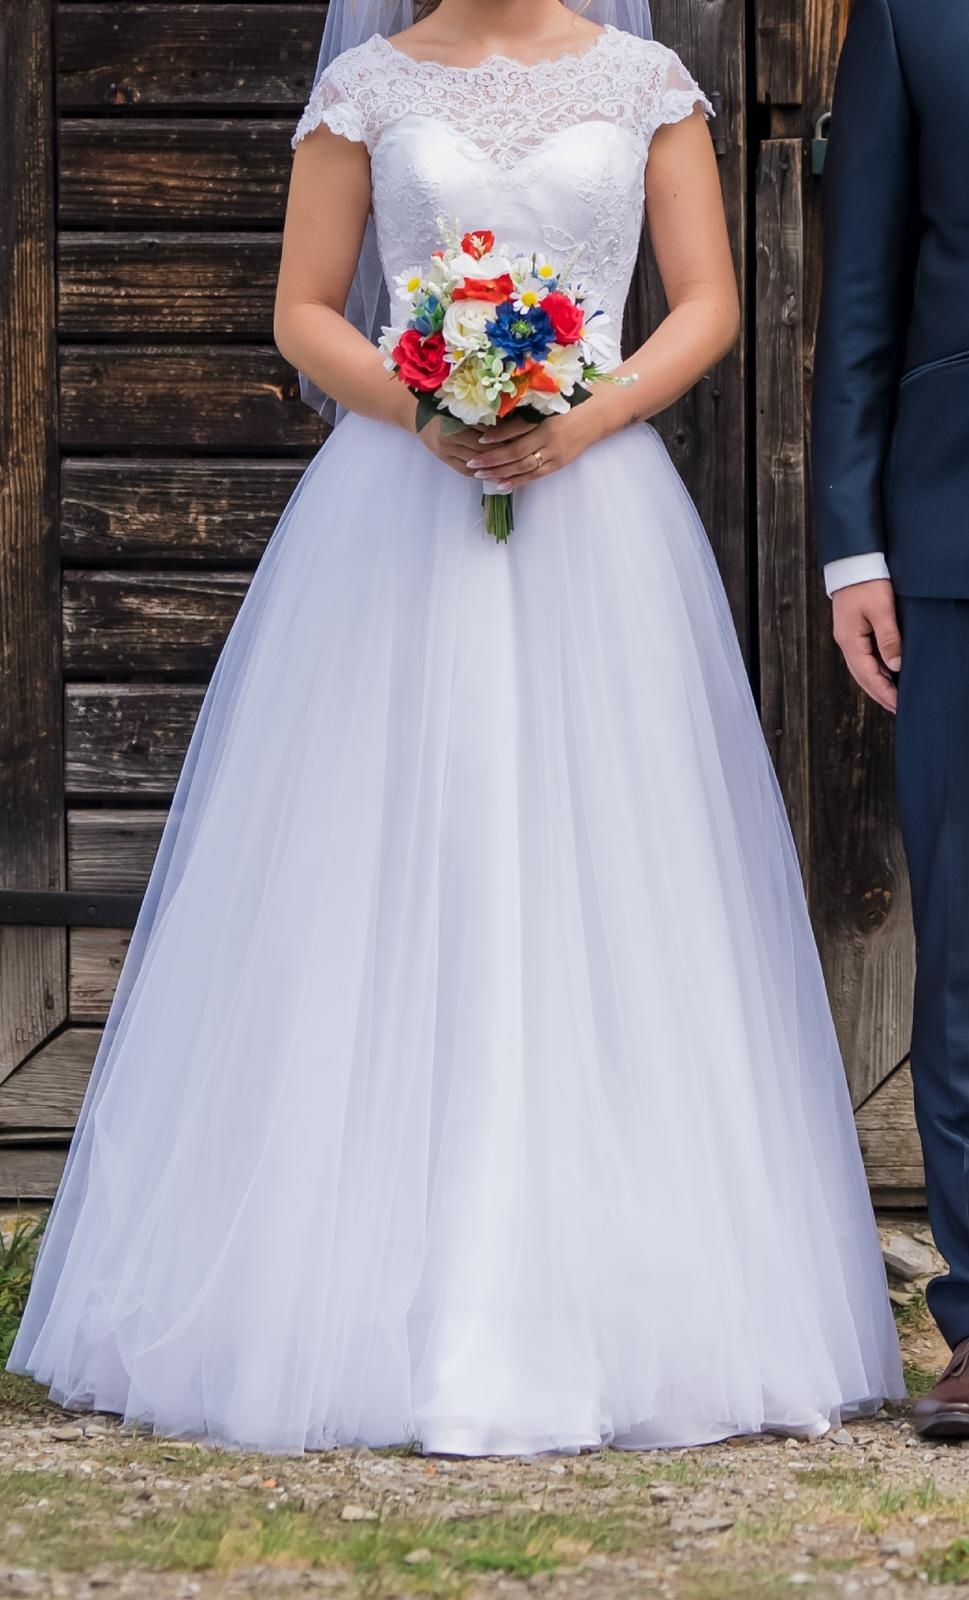 Emmi mariage svad. šaty - Obrázok č. 4